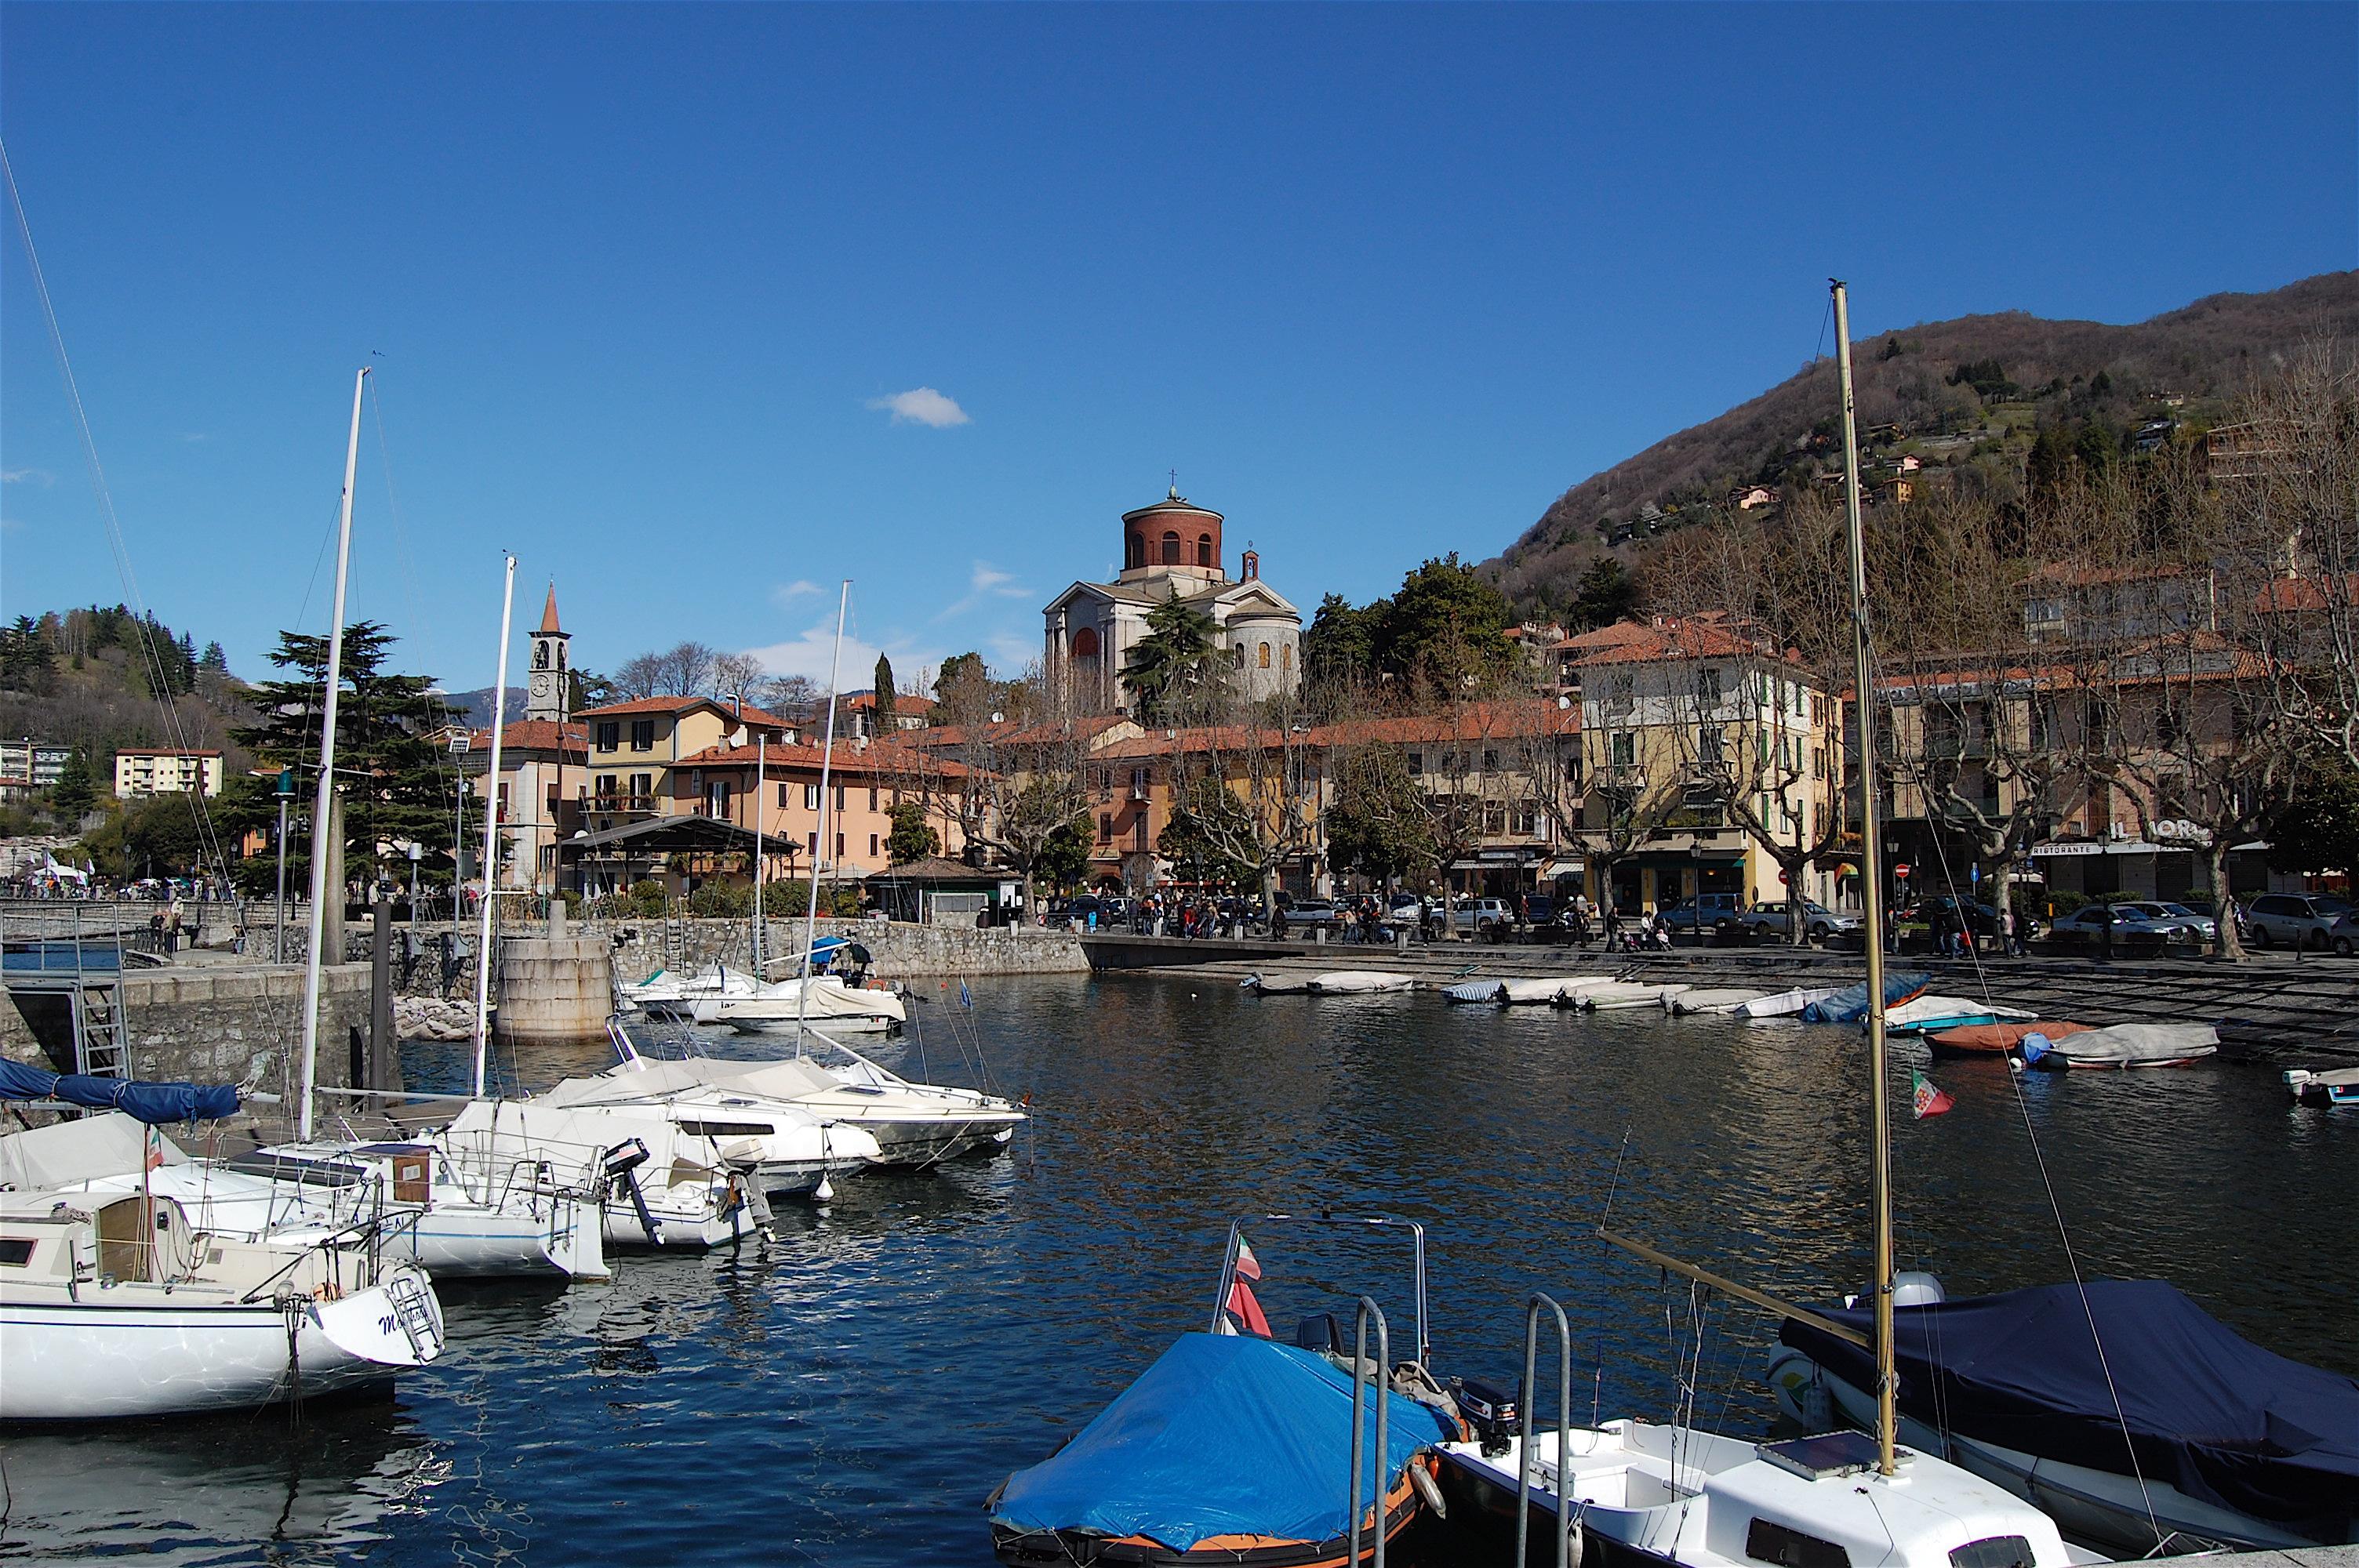 Laveno aan het lago Maggiore